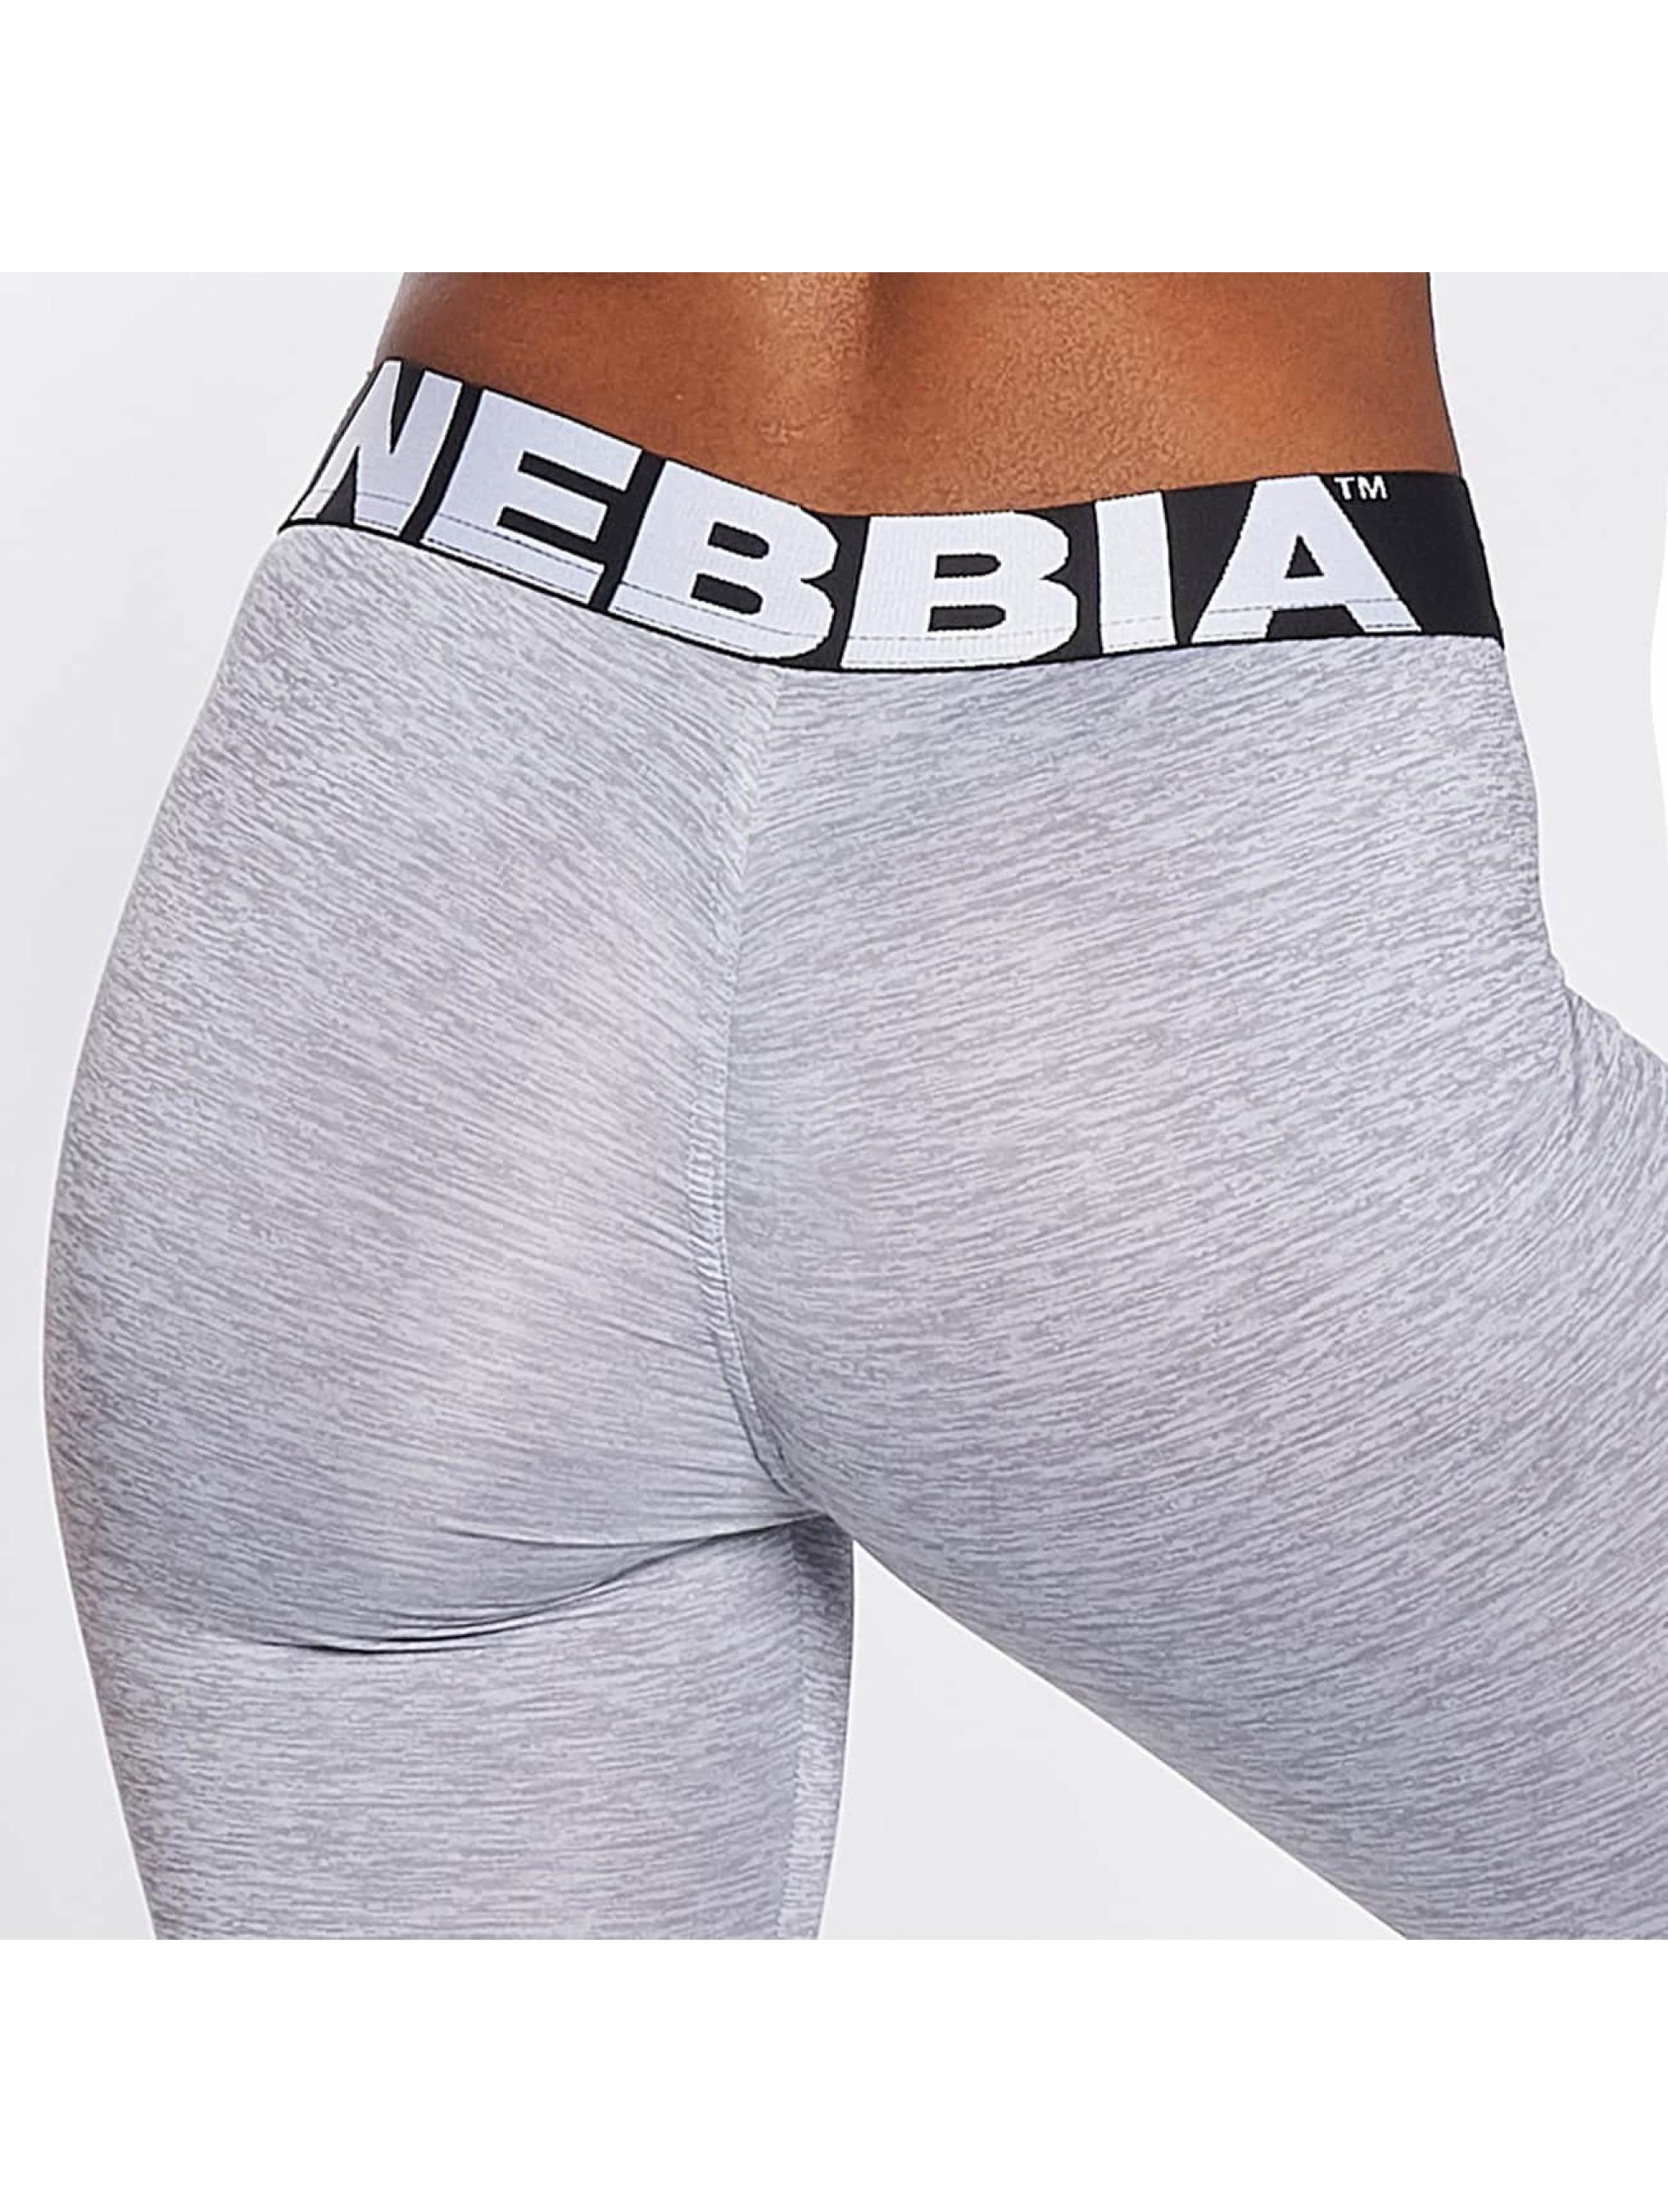 Nebbia Леггинсы Basic серый